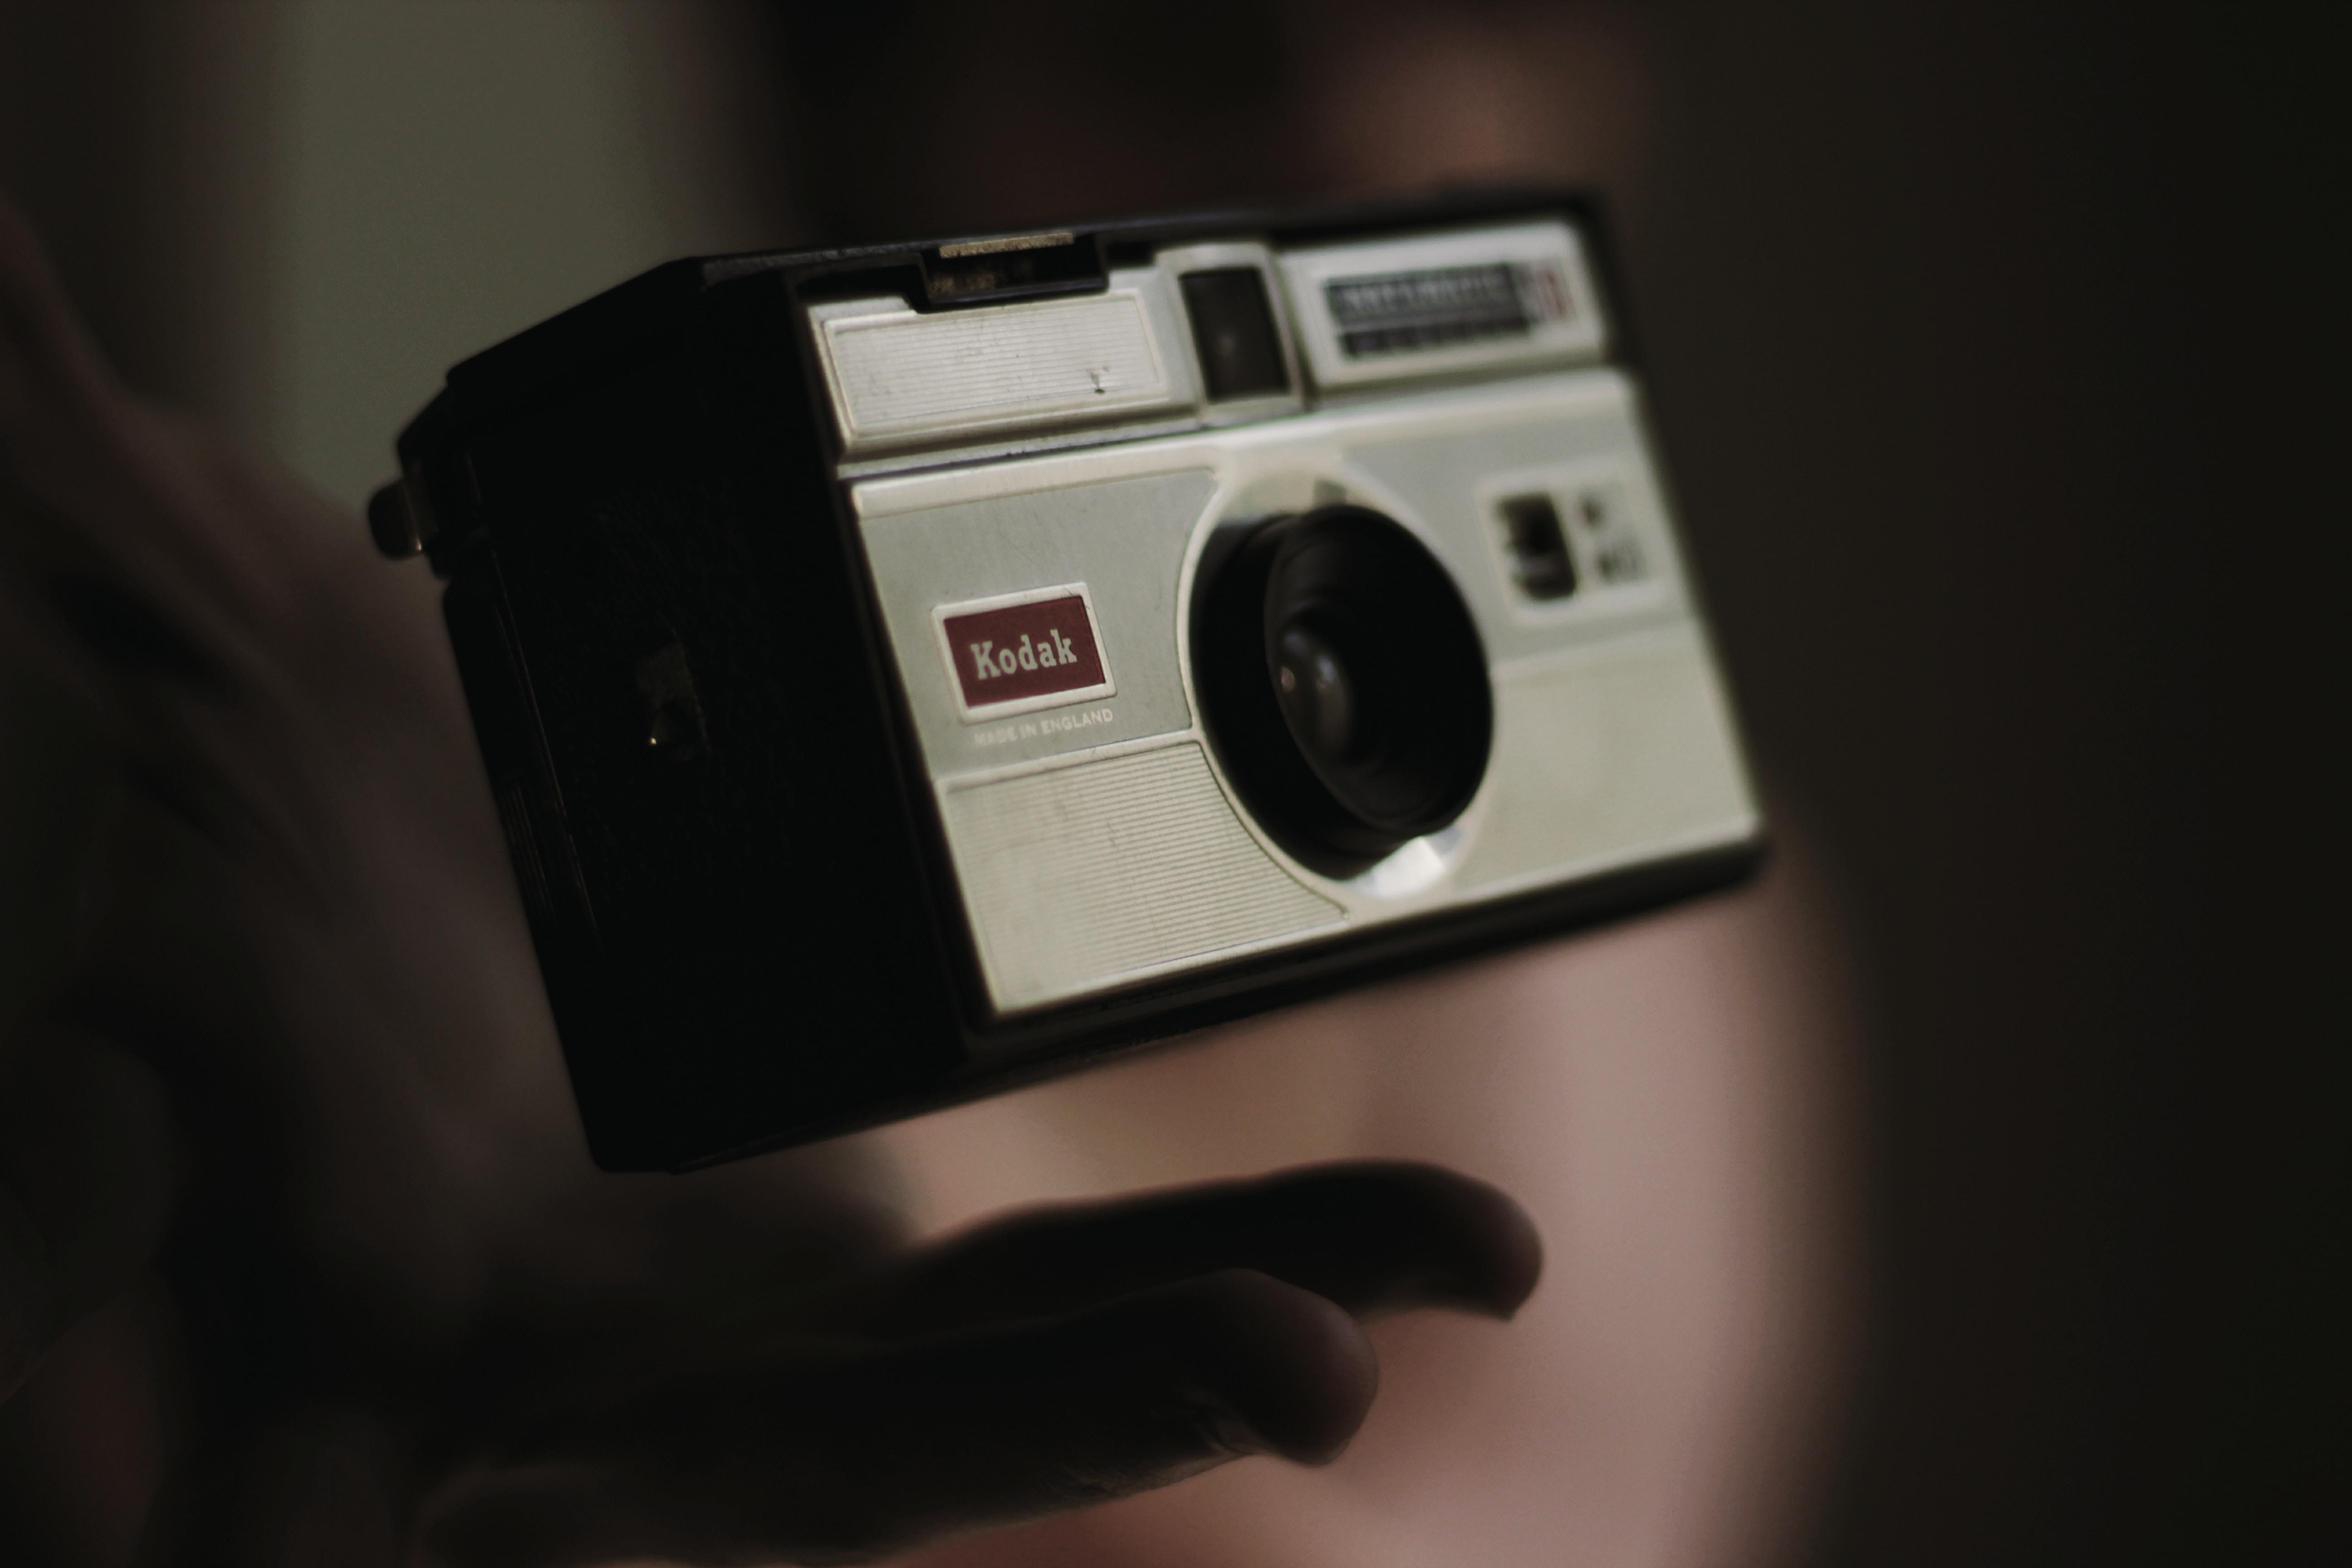 person throwing a gray and black Kodak camera